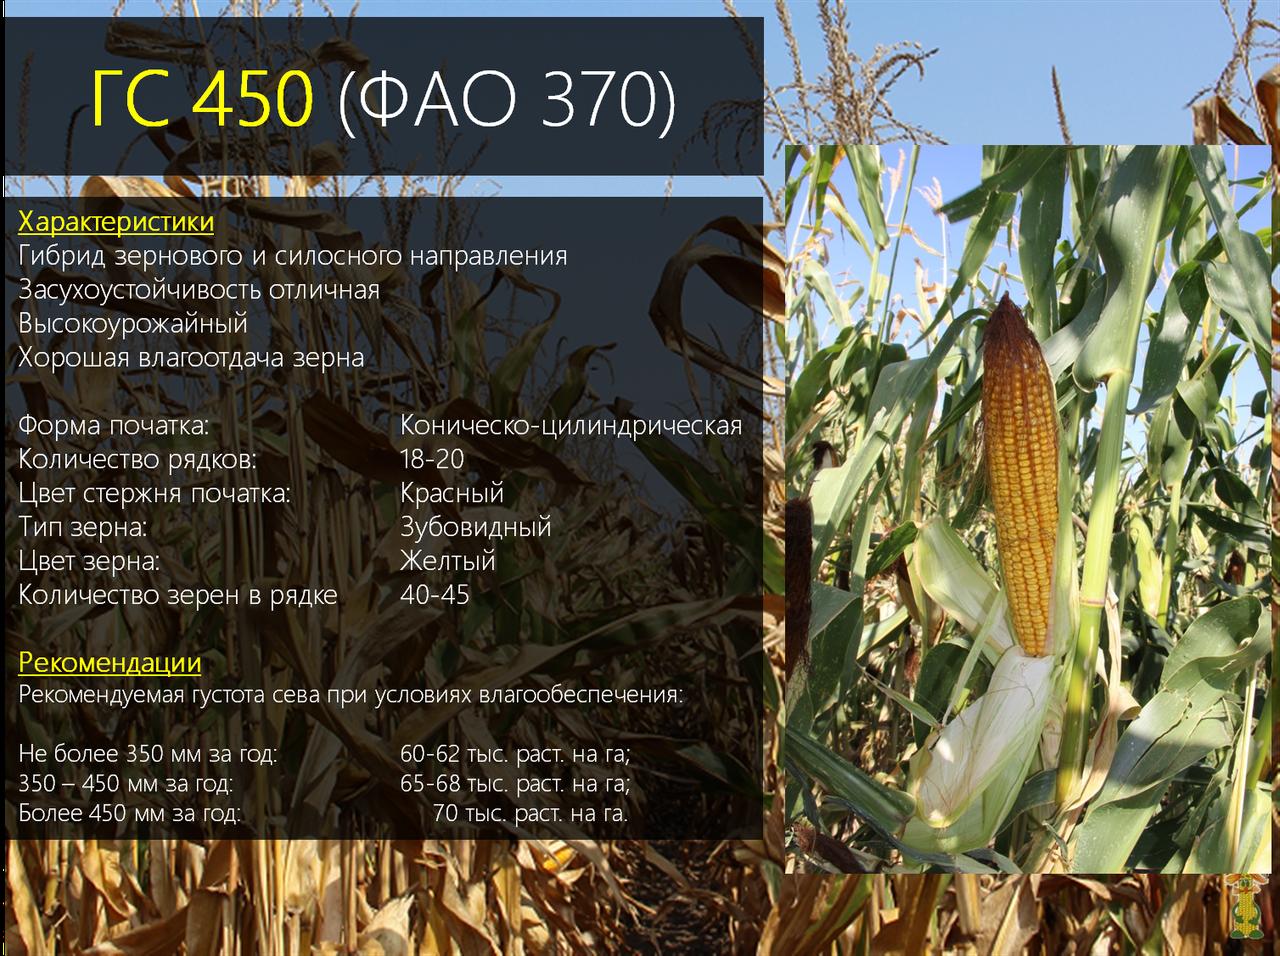 Гибрид кукурузы ГС 450 - ФАО 370 (2019)